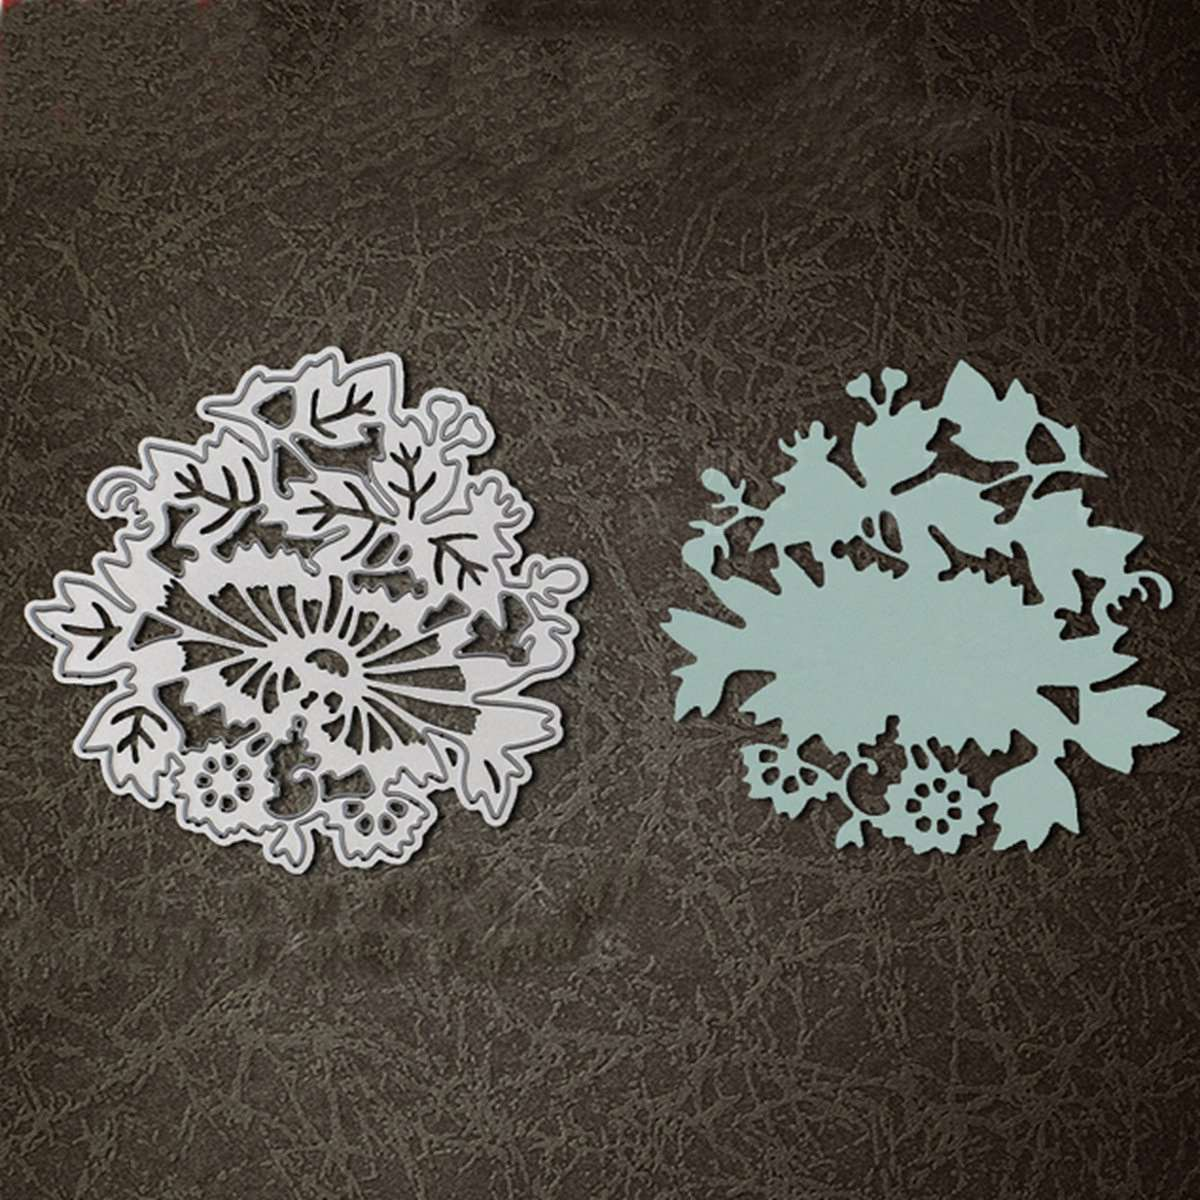 Scrapbook paper aliexpress - Flower Plant Pattern Scrapbooking Paper Embossing Diy Steel Stencil Cutting Fancy Dies Crafts Photo Card Album